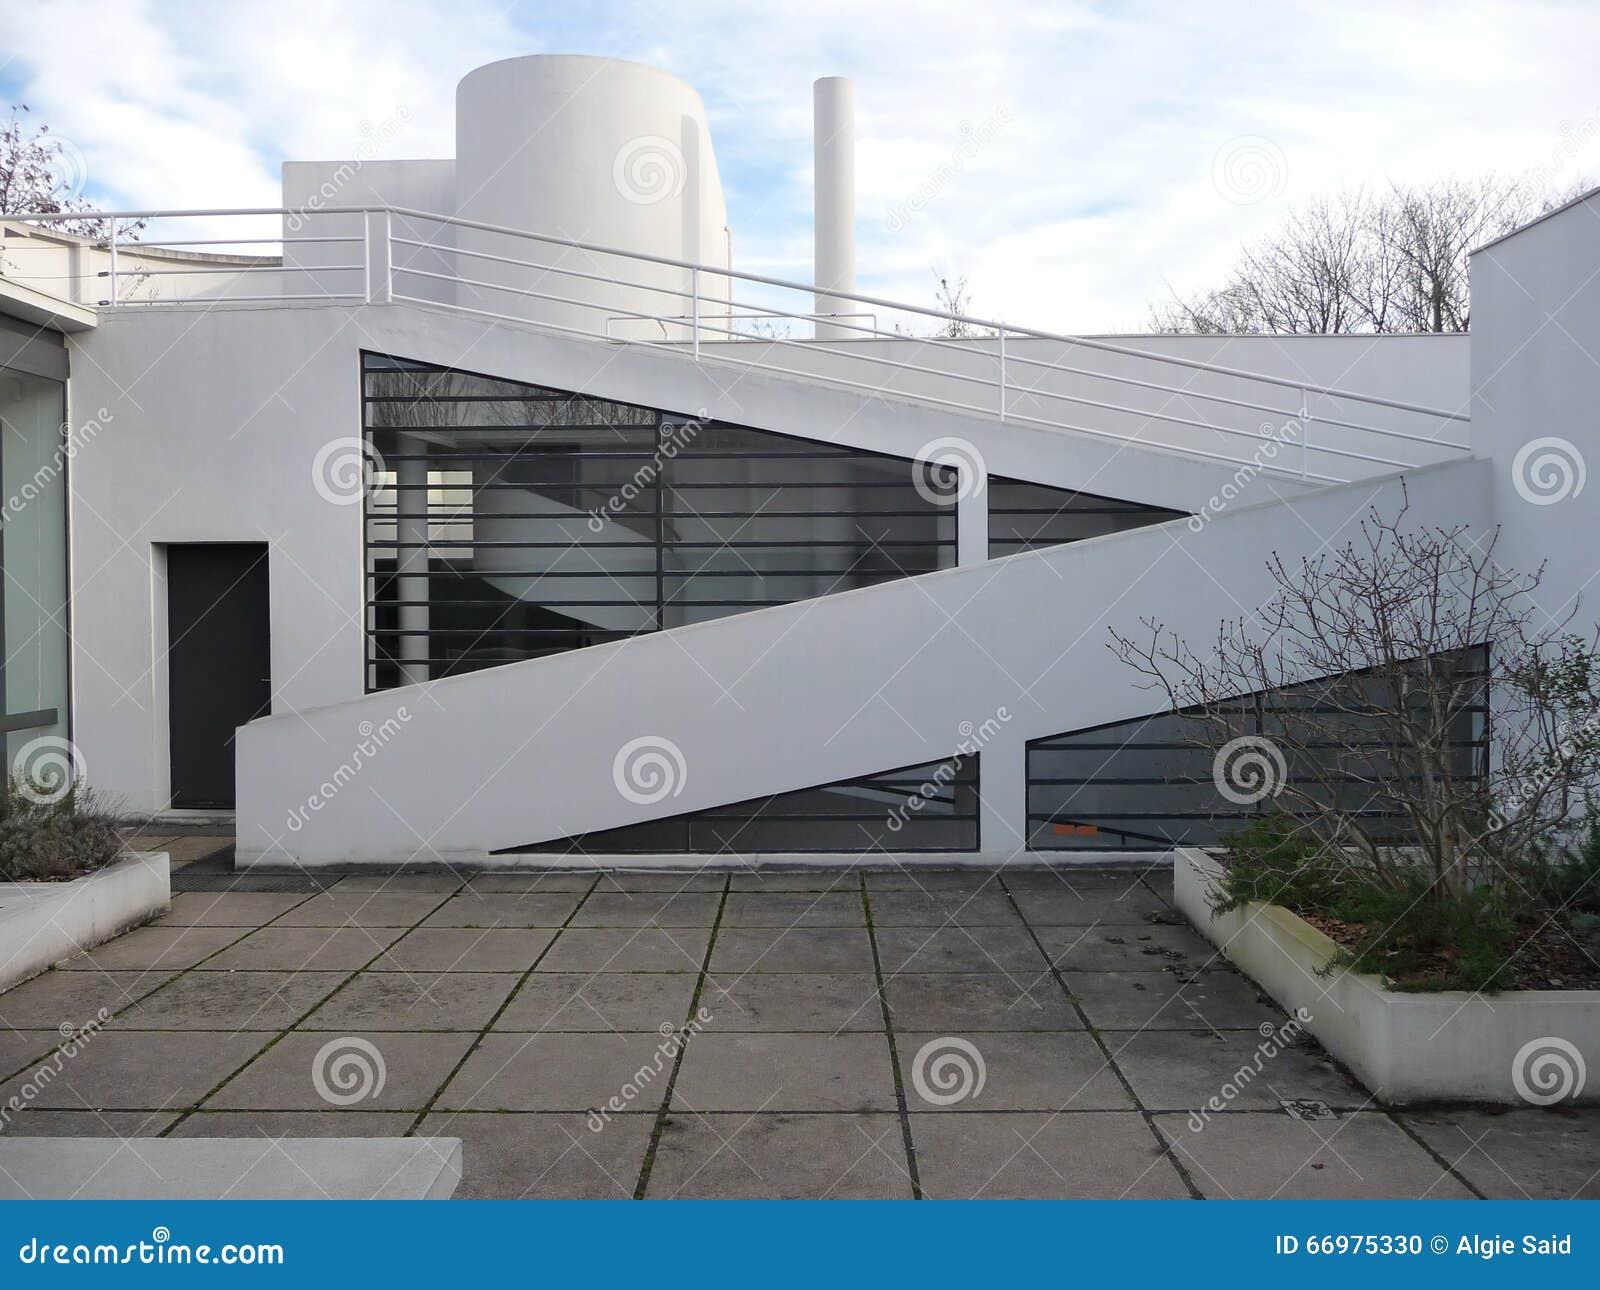 Parigi - villa Savoye (patio del tetto)